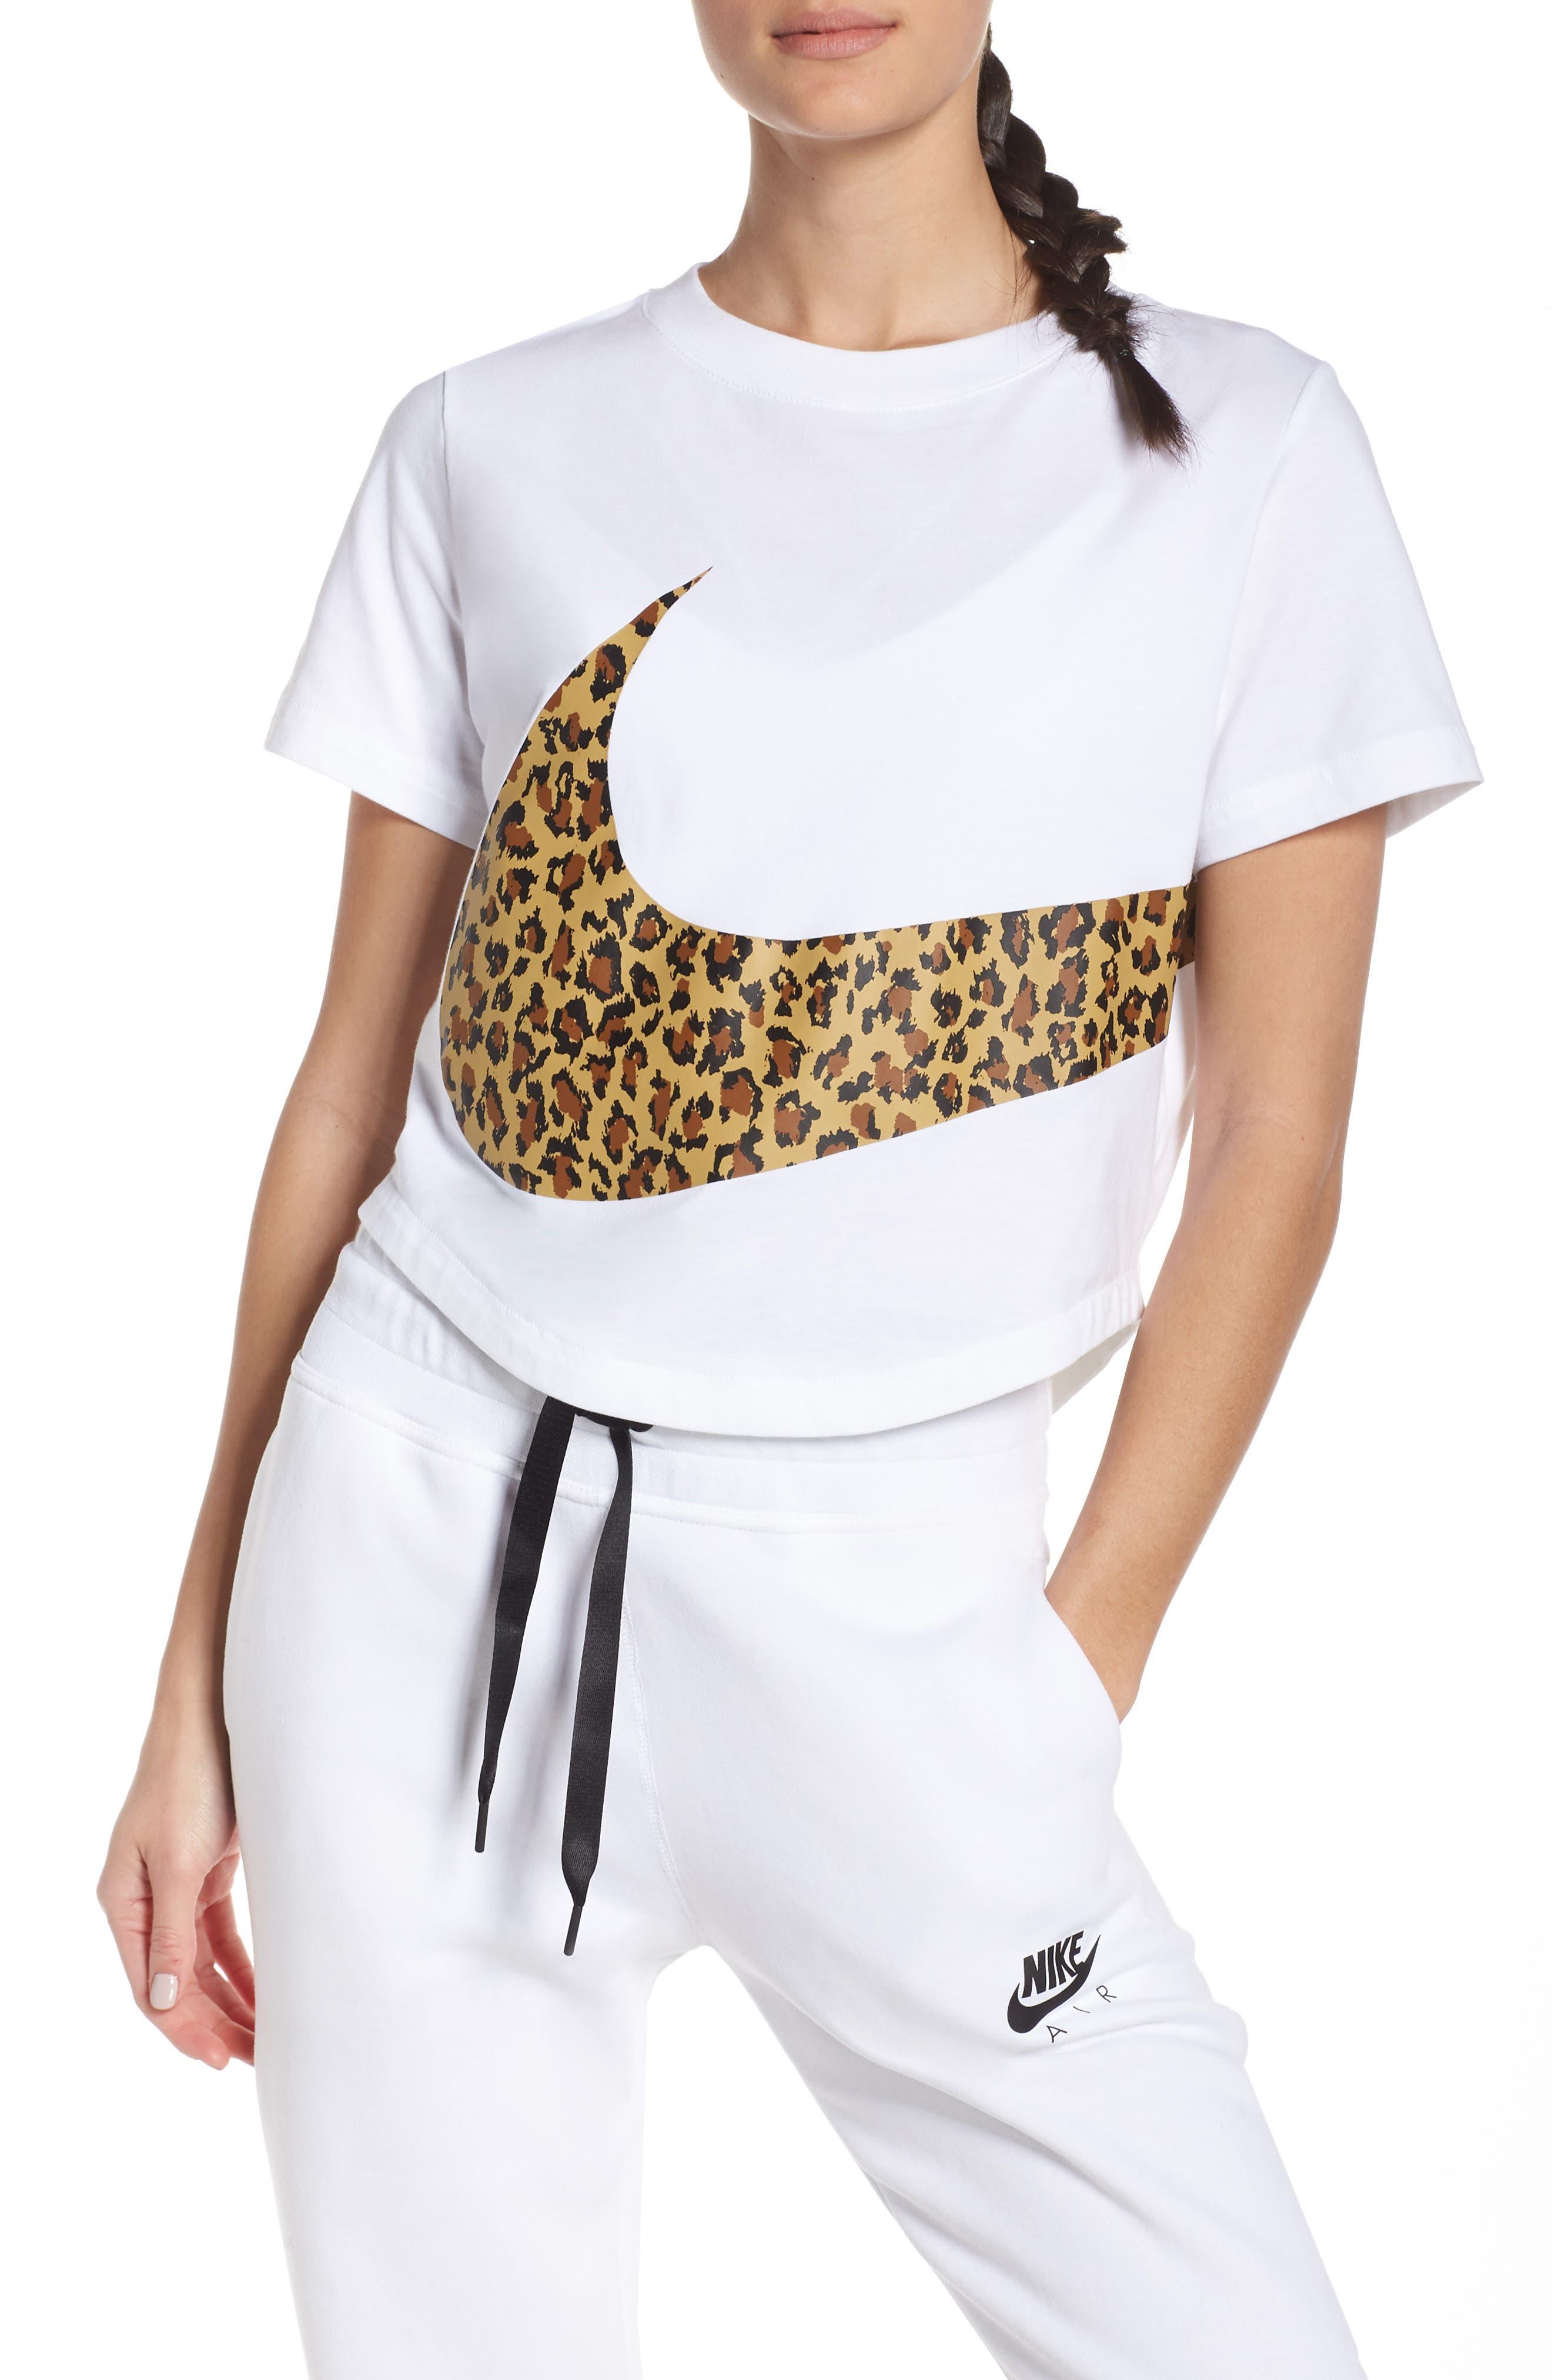 NIKE, Sportswear Women's Crop Top, Main thumbnail 1, color, WHITE